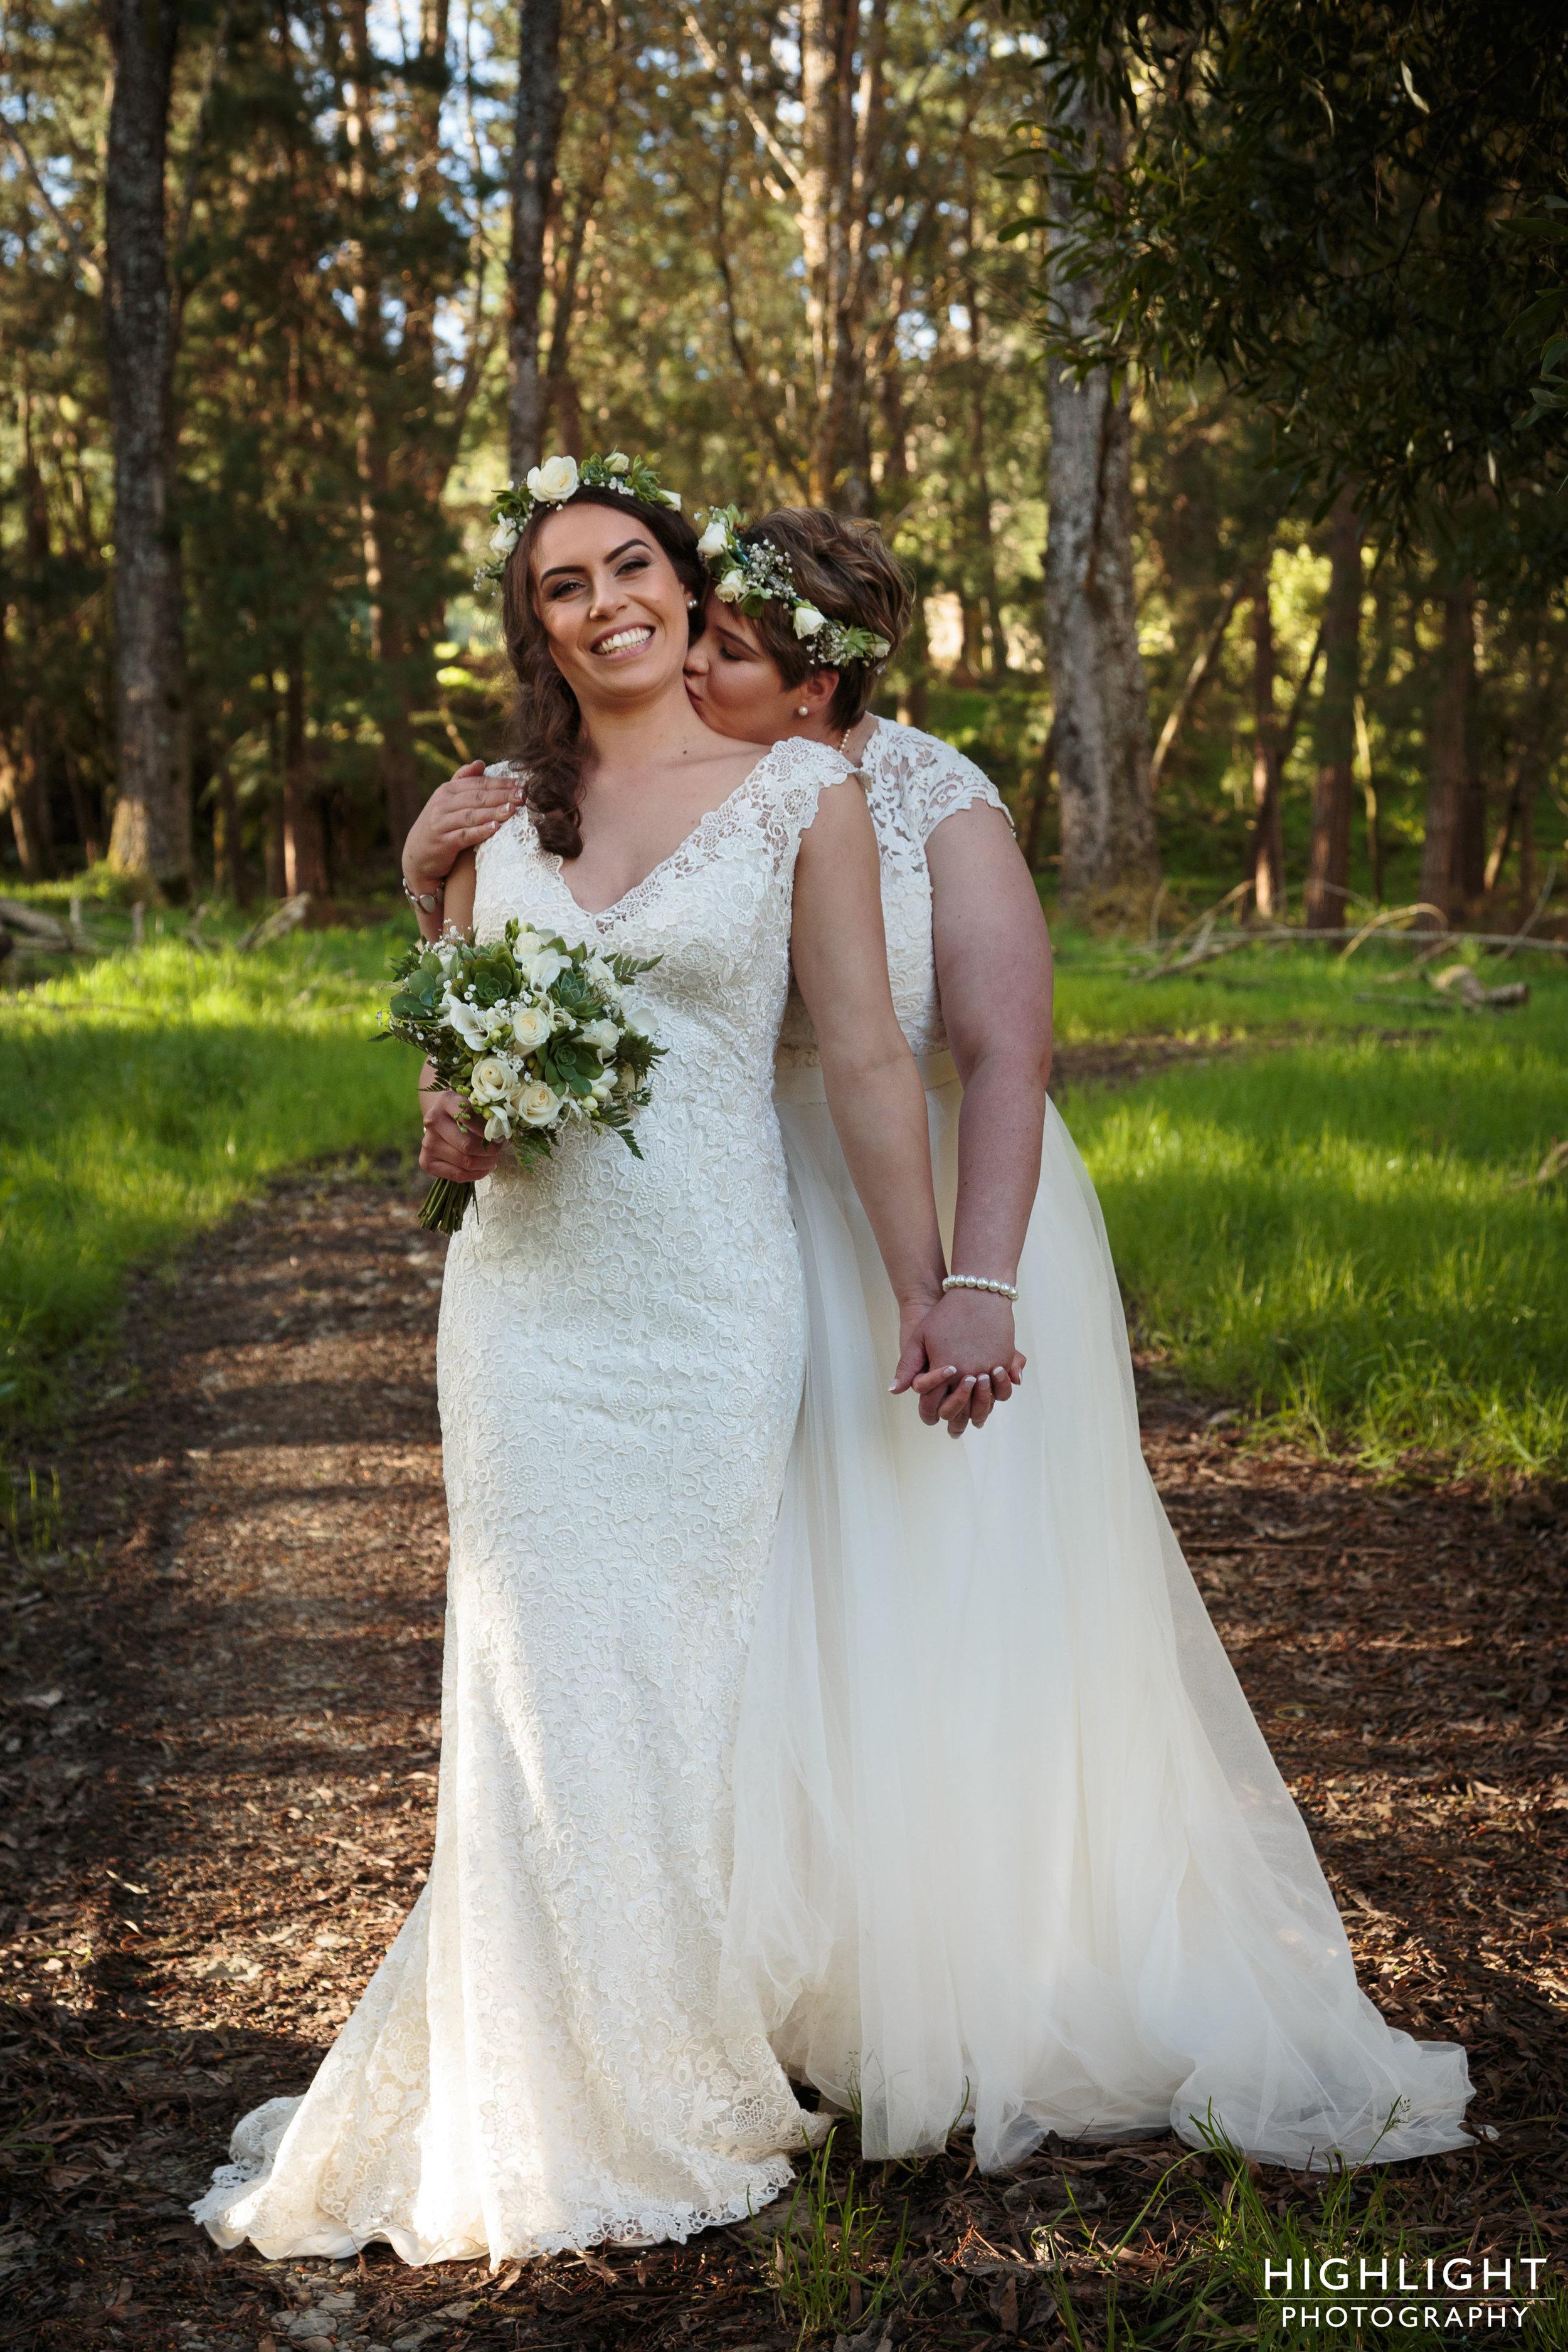 highlight_wedding_photography_makoura_lodge_manawatu_new_zealand-124.jpg